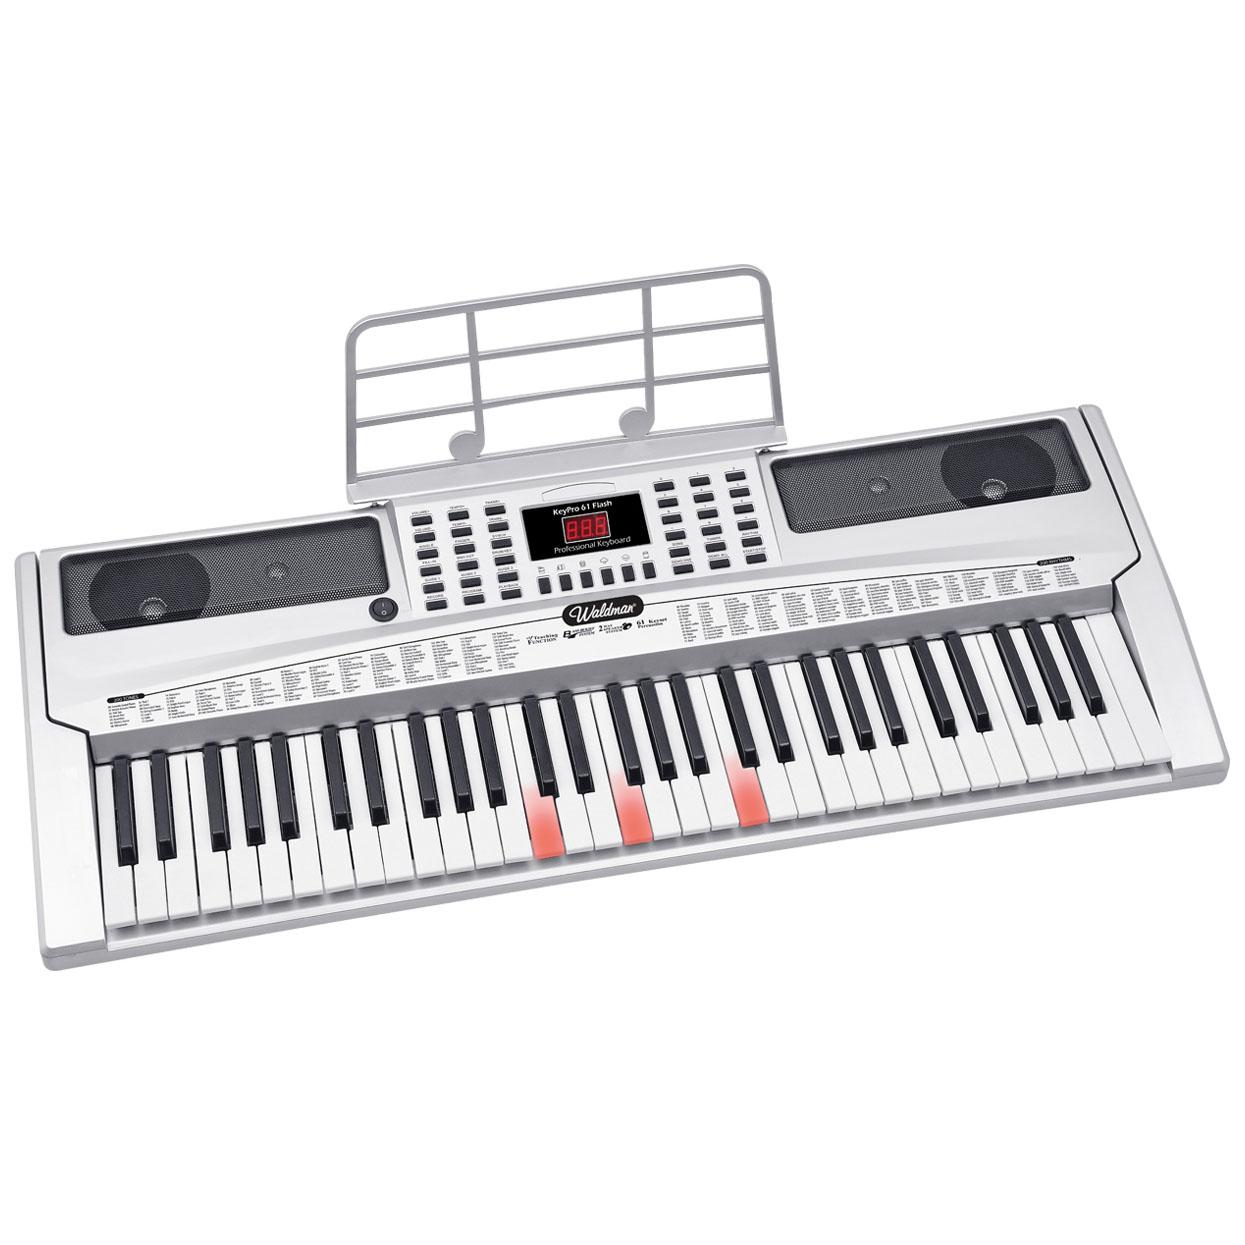 Teclado KeyPro 61 teclas iluminadas Waldman KEP-61F